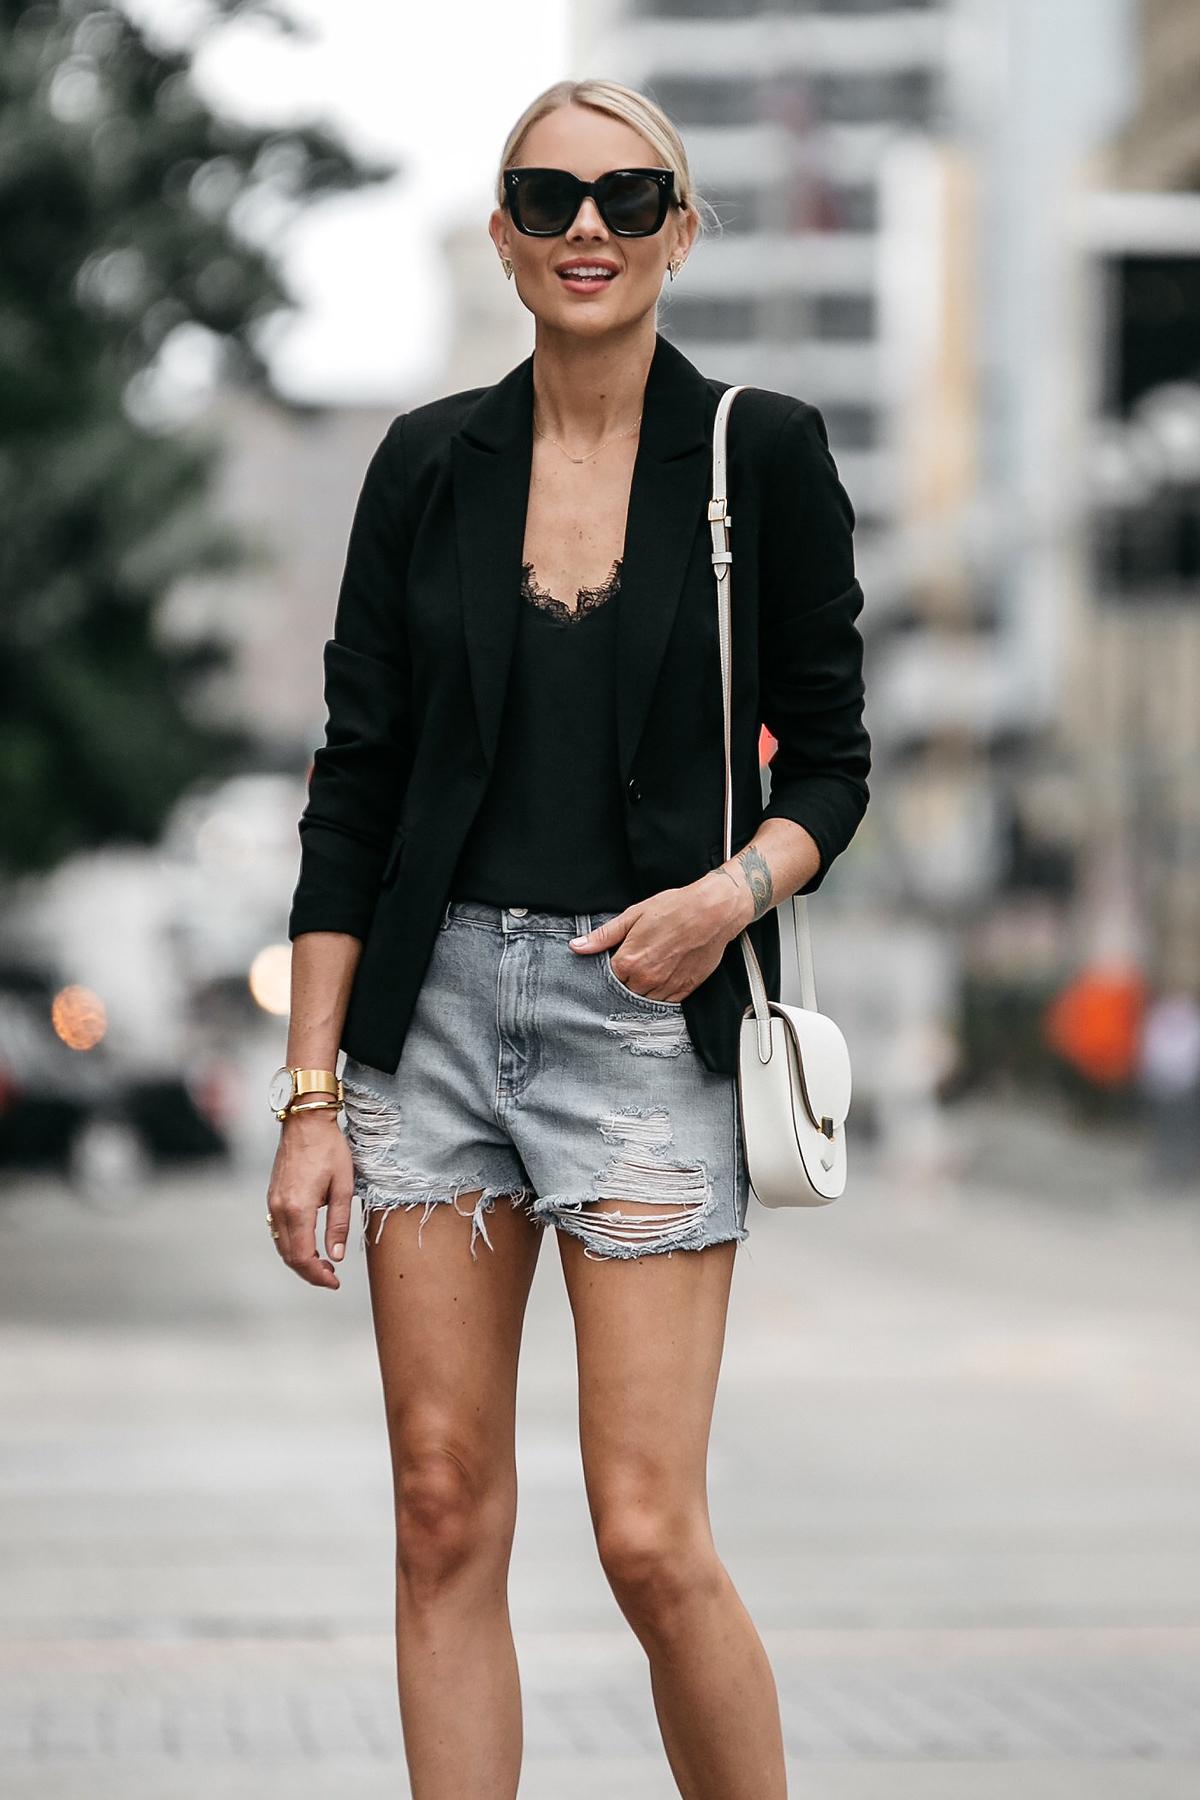 Blonde Woman Wearing Nordstrom Black Blazer Anine Bing Black Lace Cami Topshop Denim Cutoff Shorts Outfit Celine White Trotteur Handbag Street Style Dallas Blogger Fashion Blogger